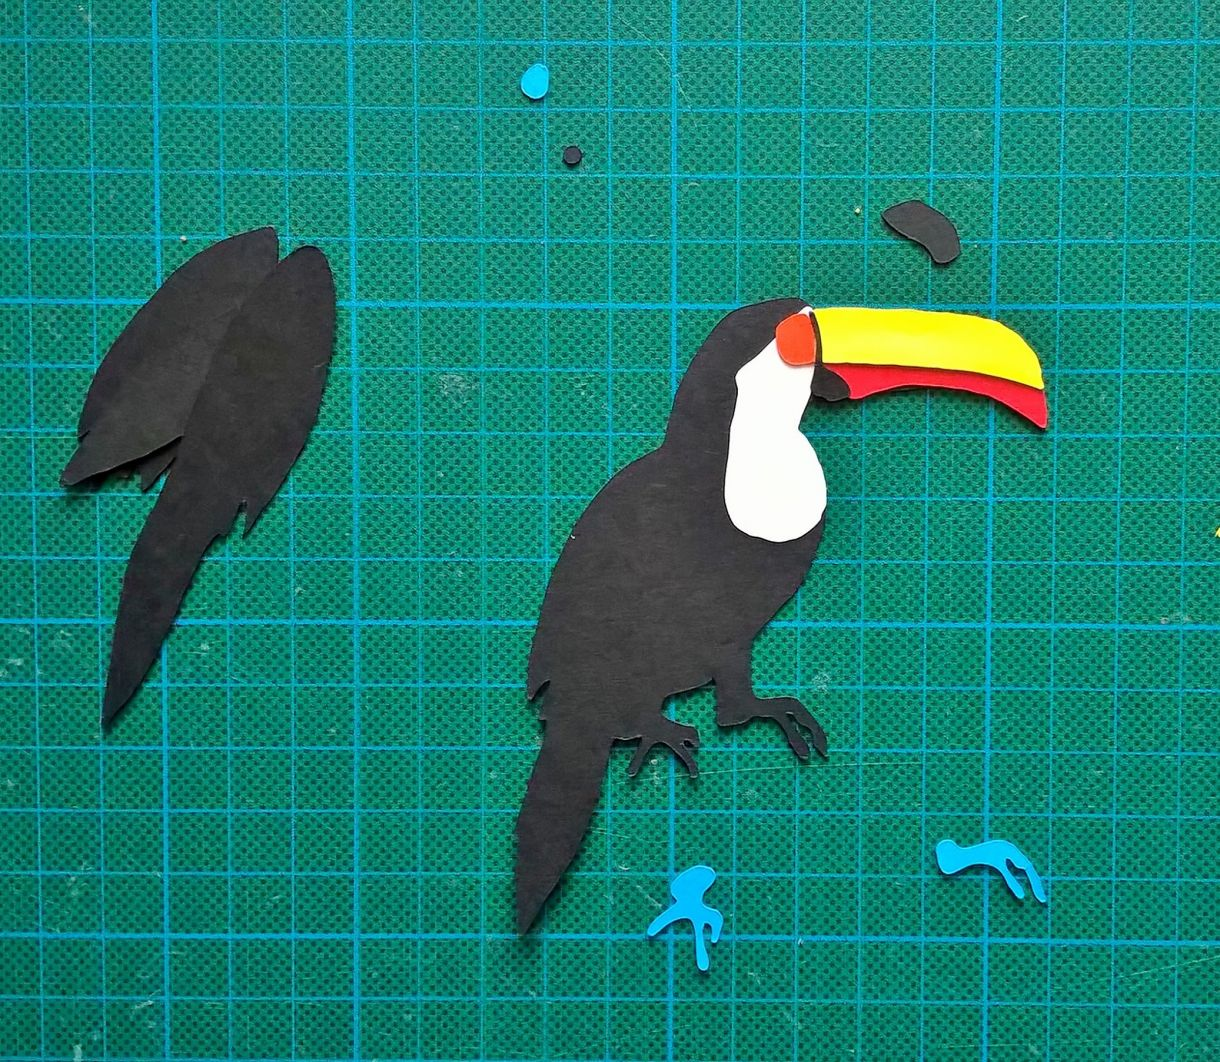 Toucan 10